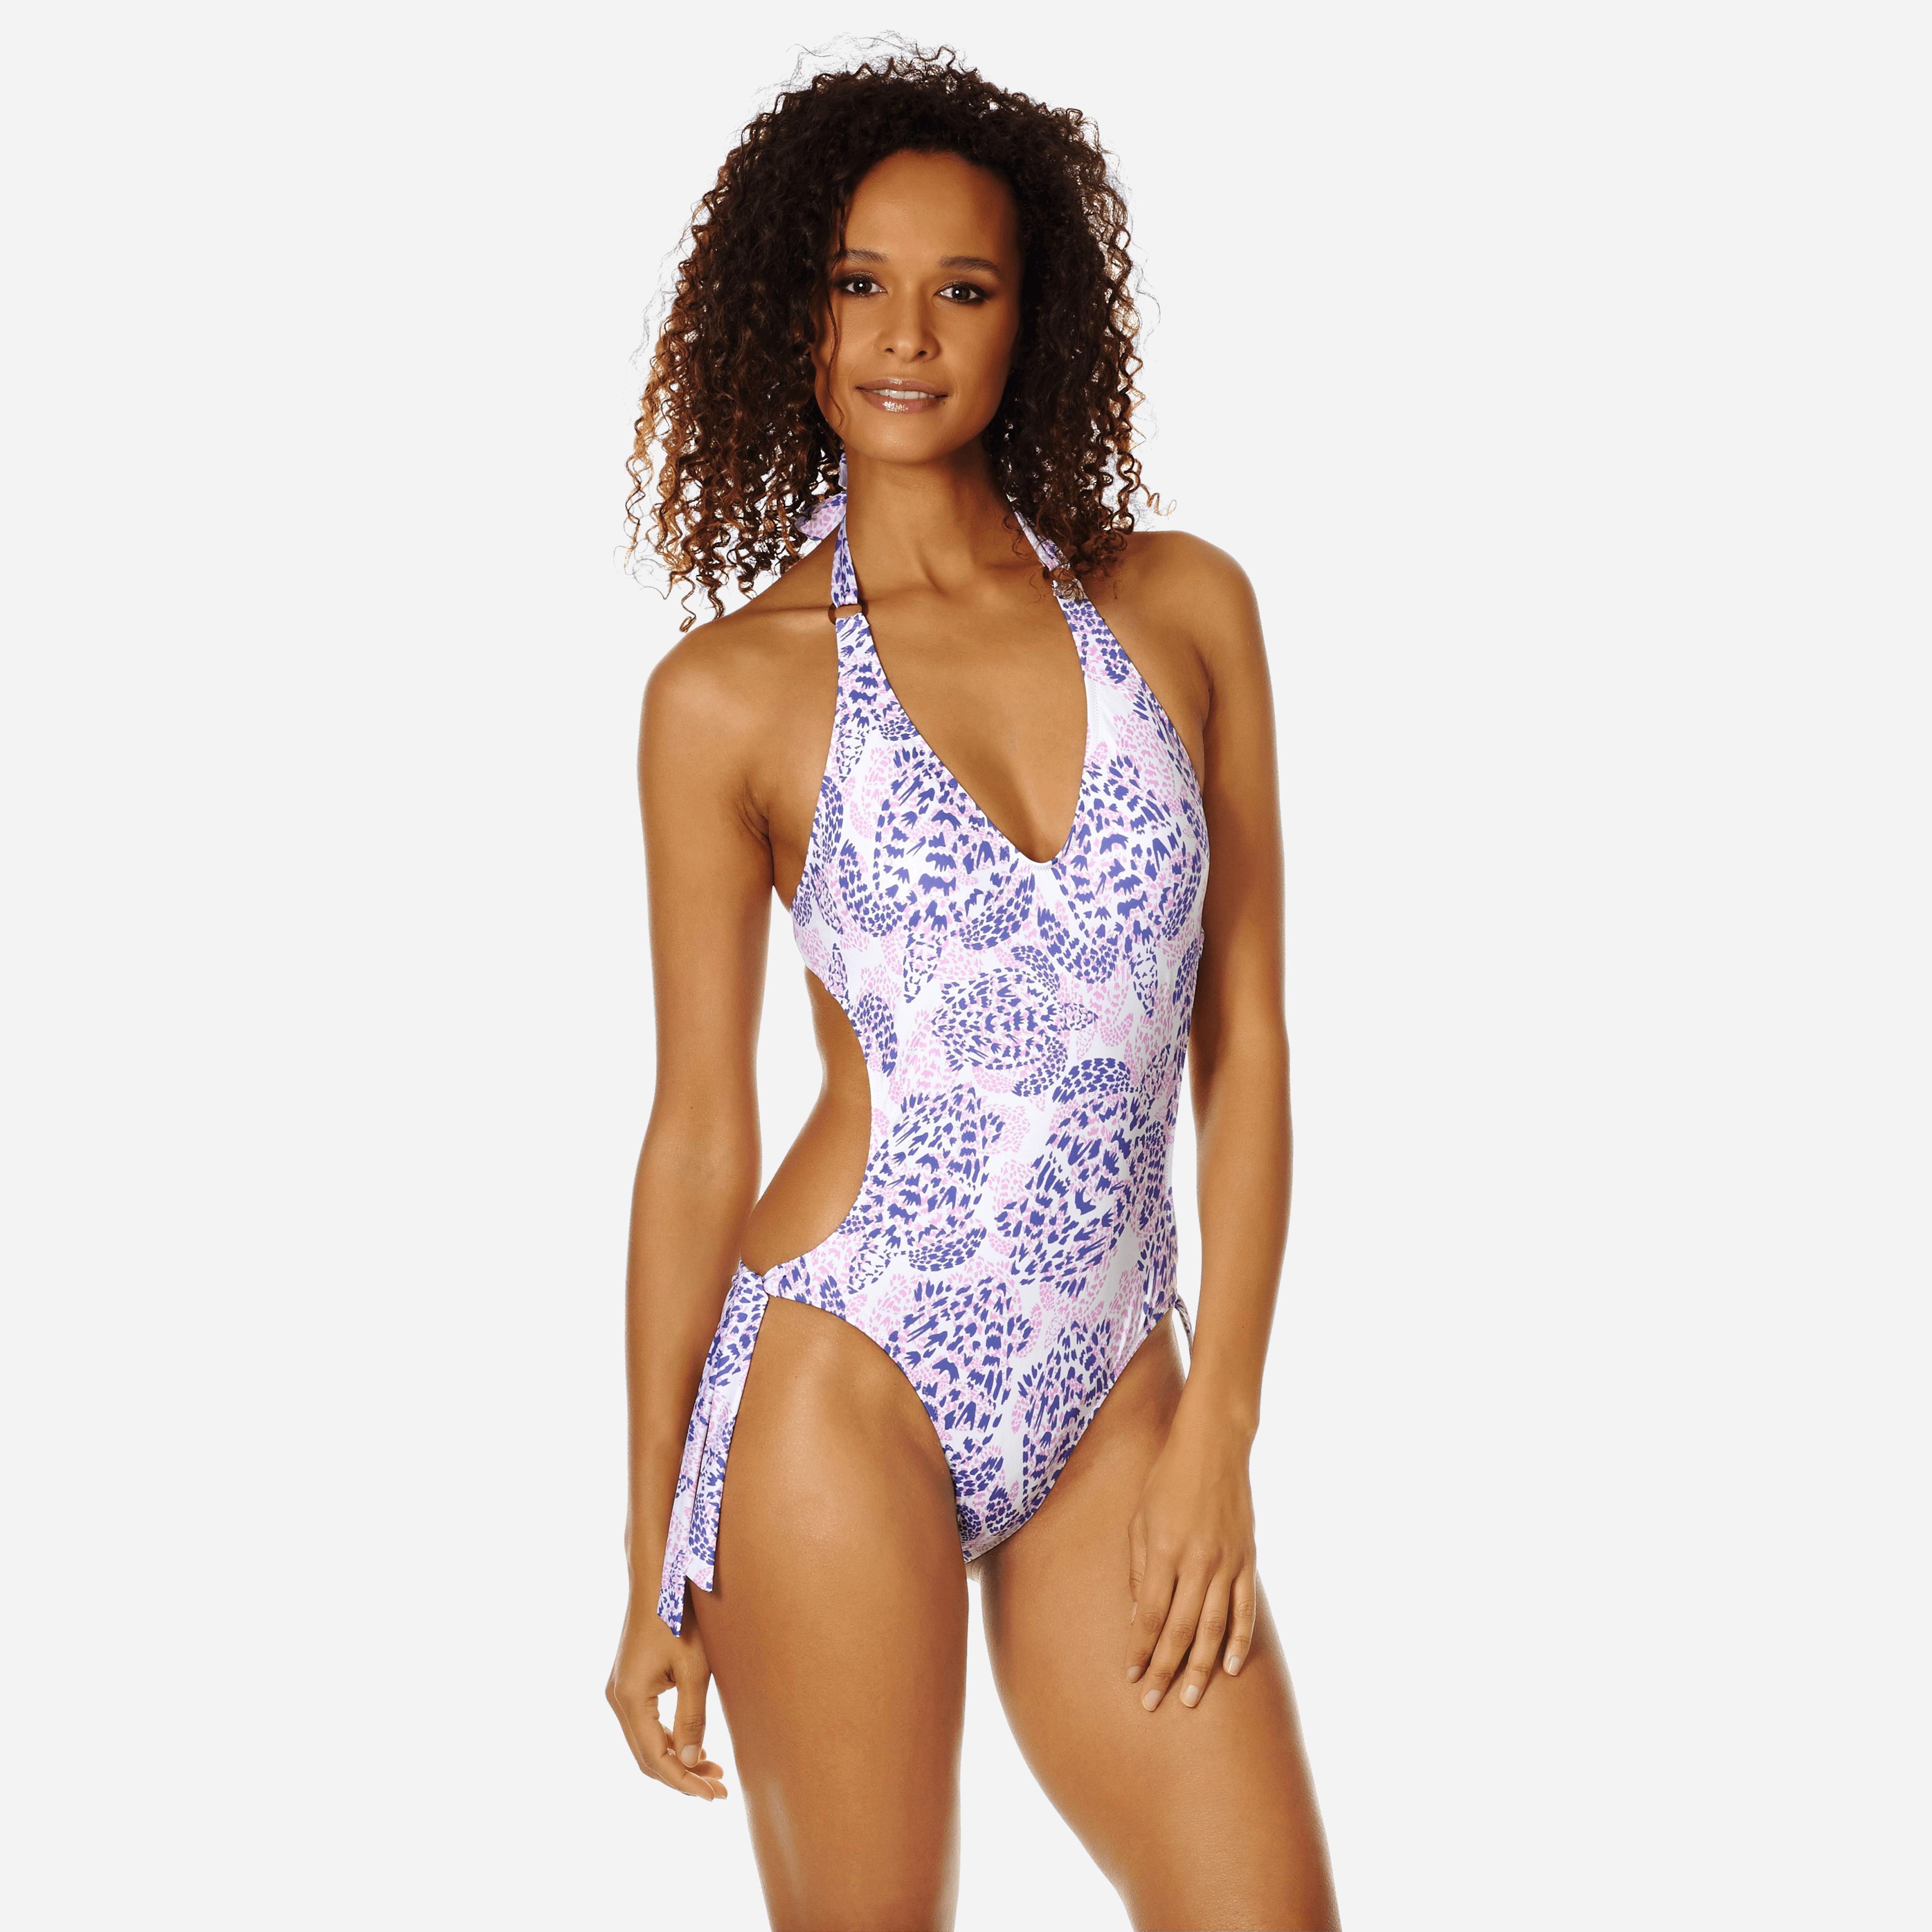 VILEBREQUIN | Women Swimwear - Women One Piece Swimsuit Trikini Jungle Turtles - SWIMMING TRUNK - FIFI - White - XXS - Vilebrequin | Goxip